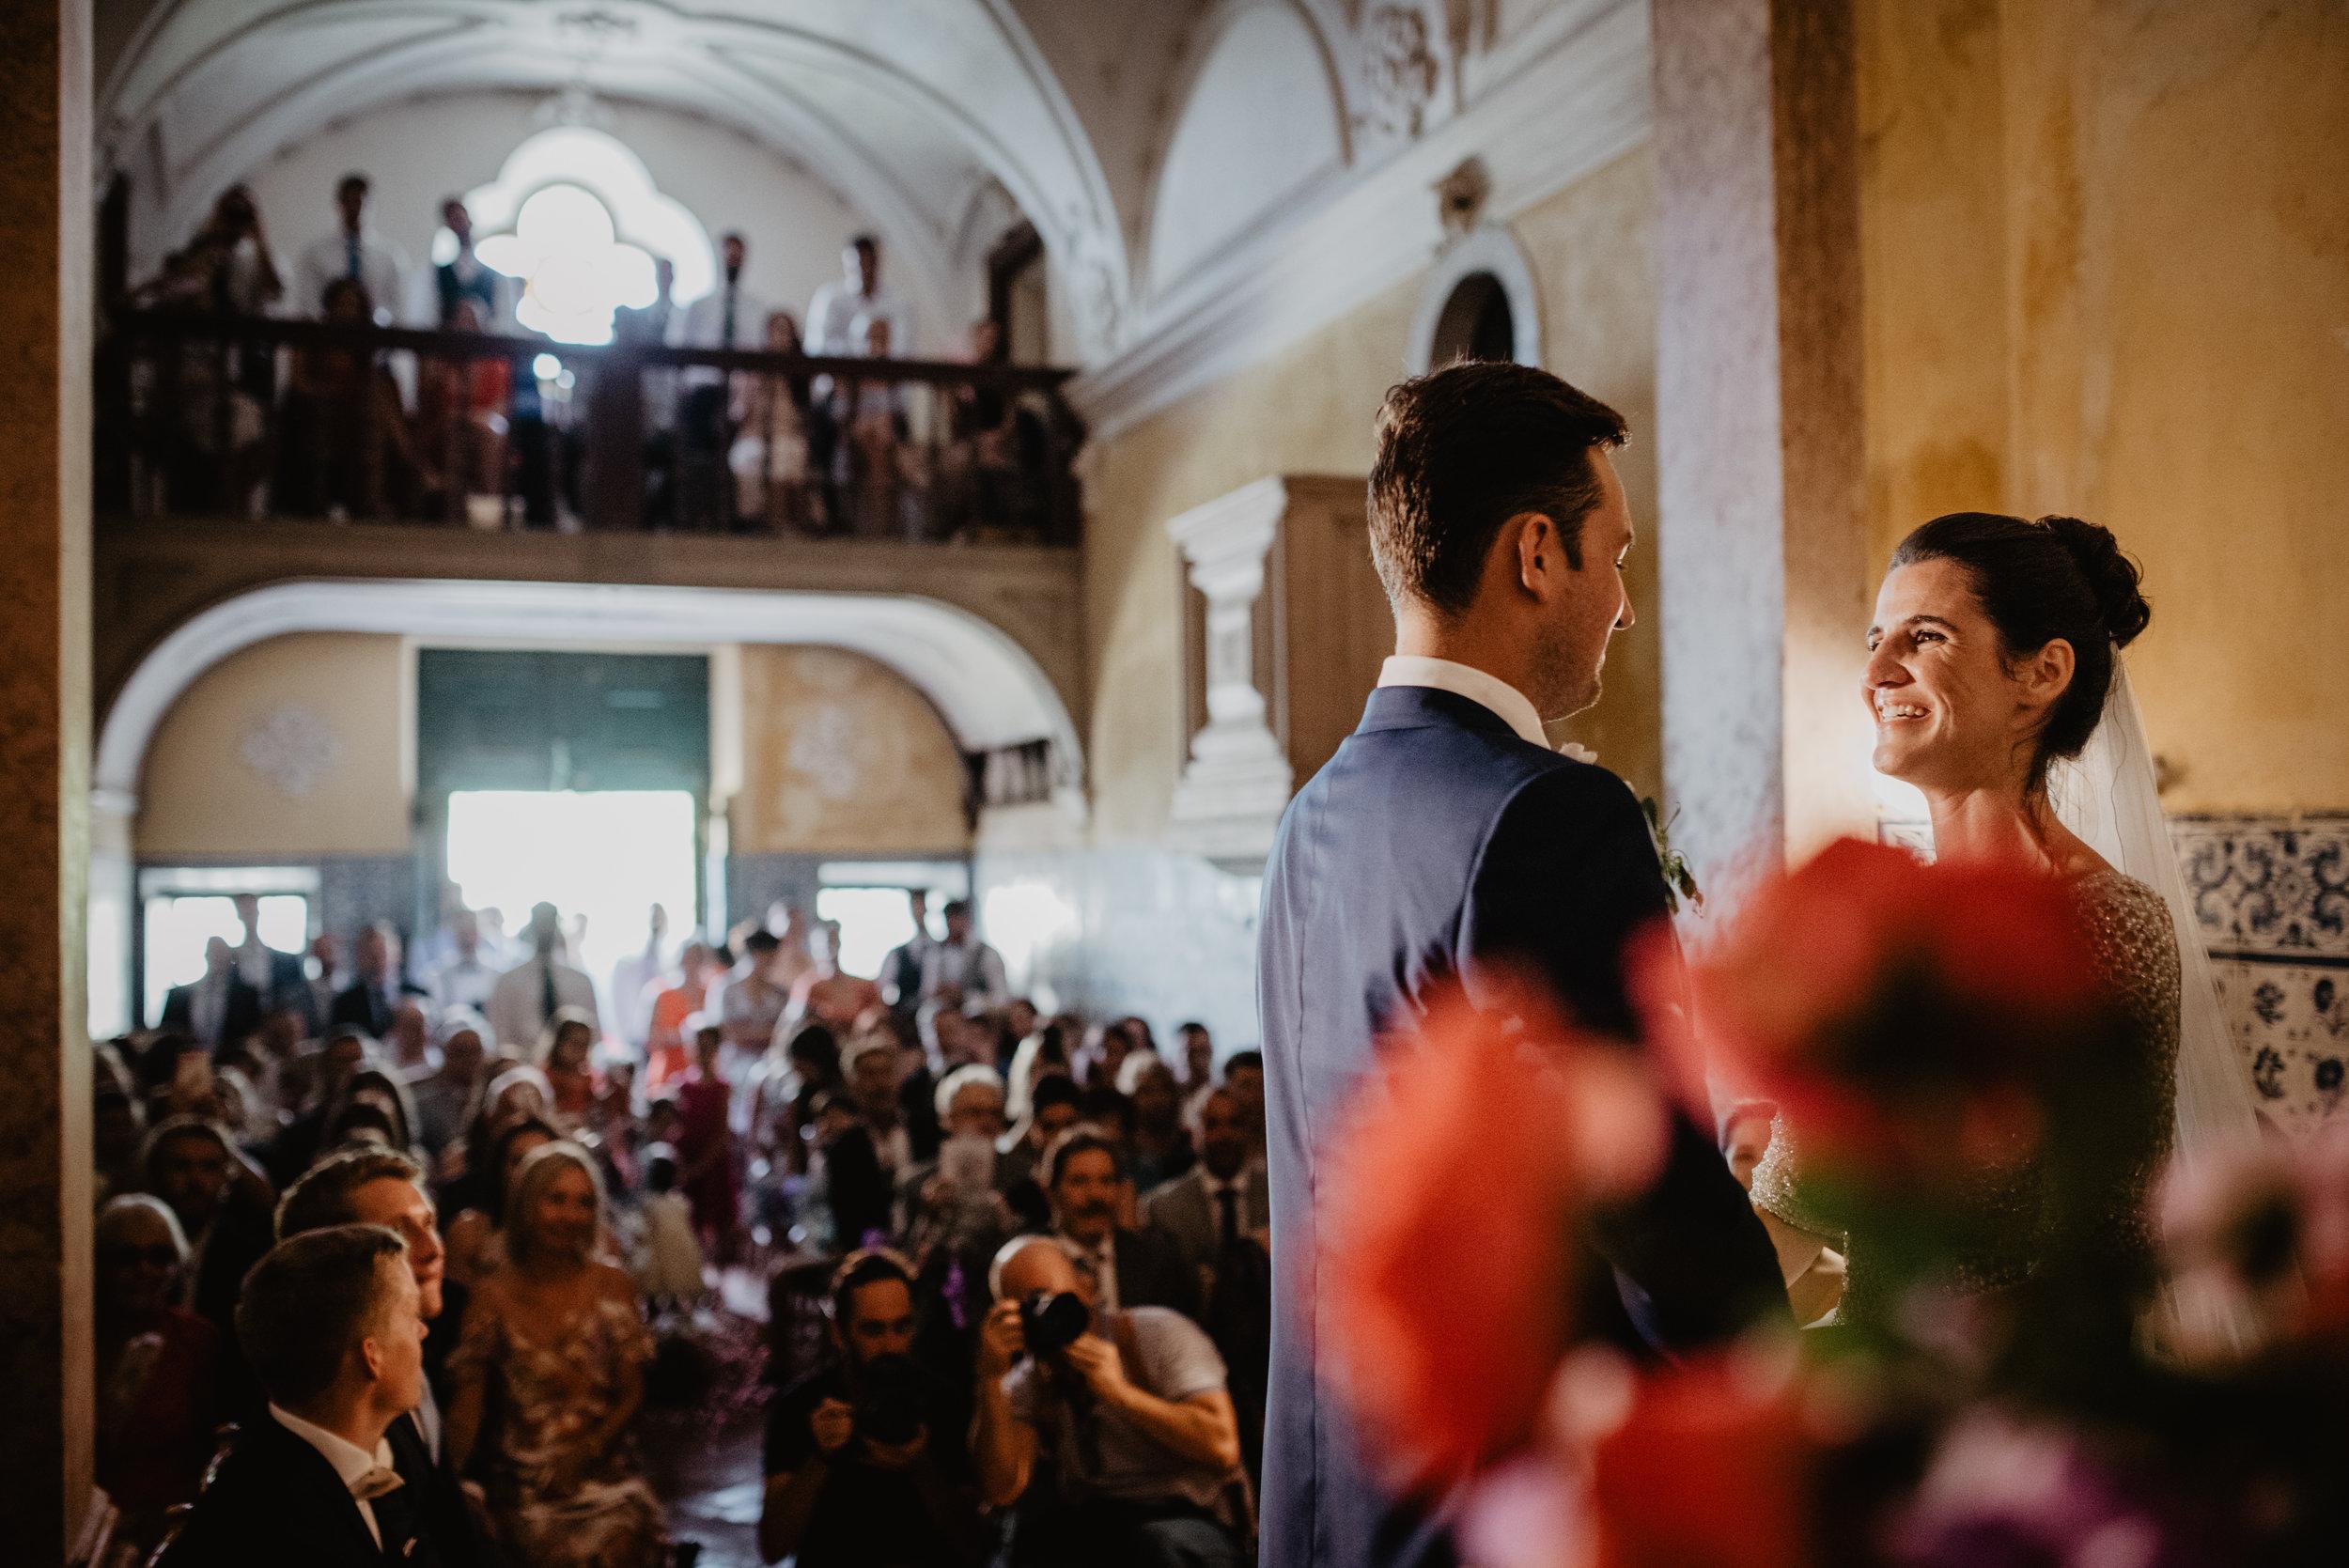 Lapela-photography-wedding-sintra-portugal-56.jpg